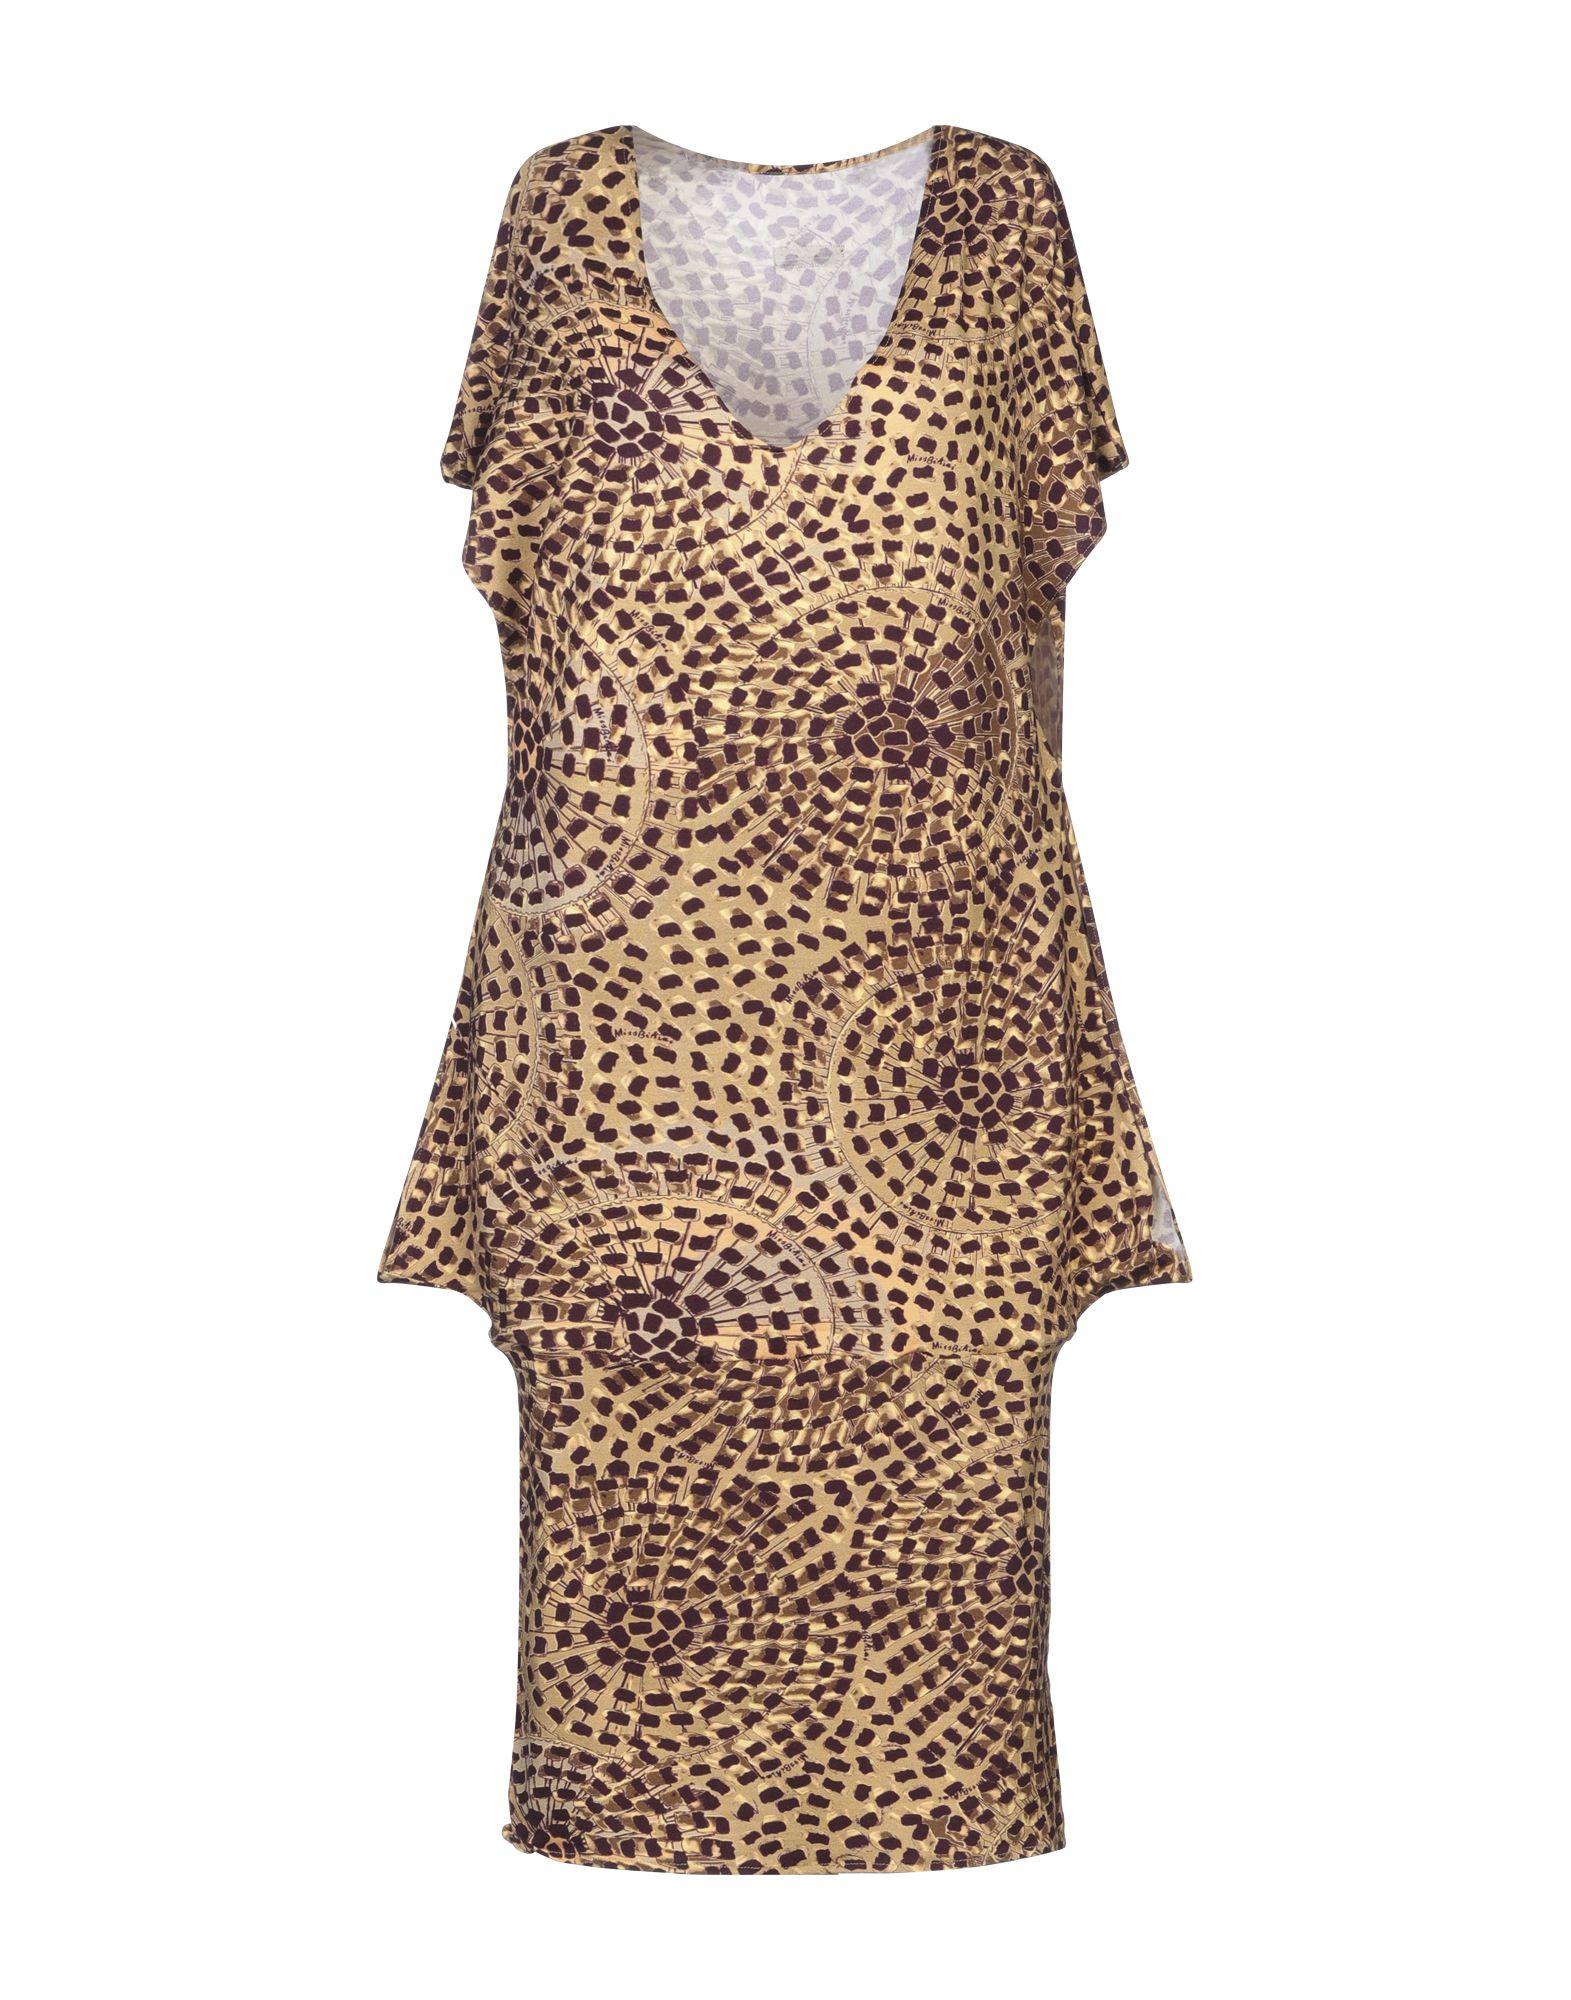 MISS BIKINI LUXE Платье до колена